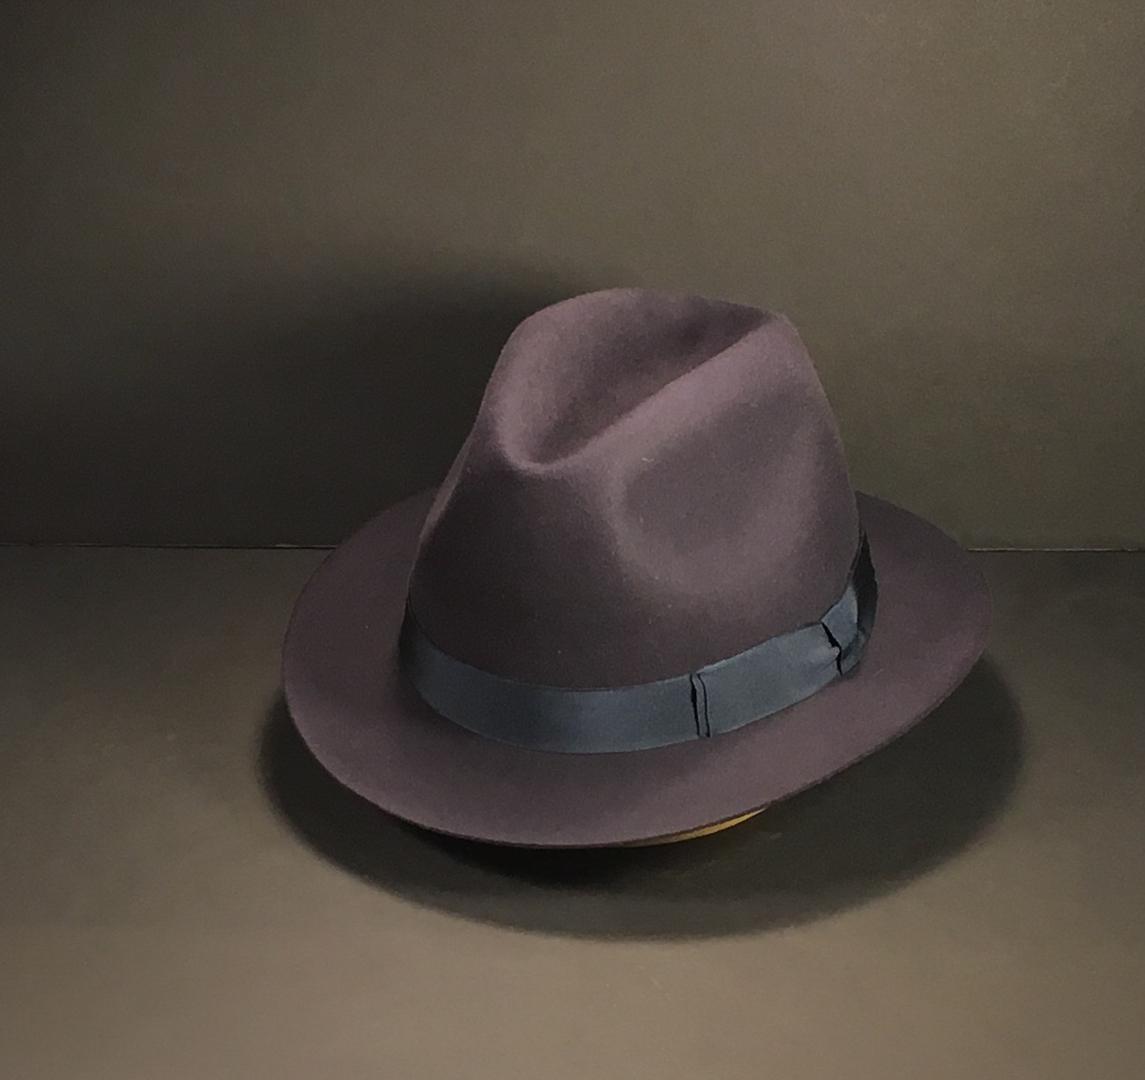 The Penman Hat Company - Fedora Hats For Men 191192c23f2